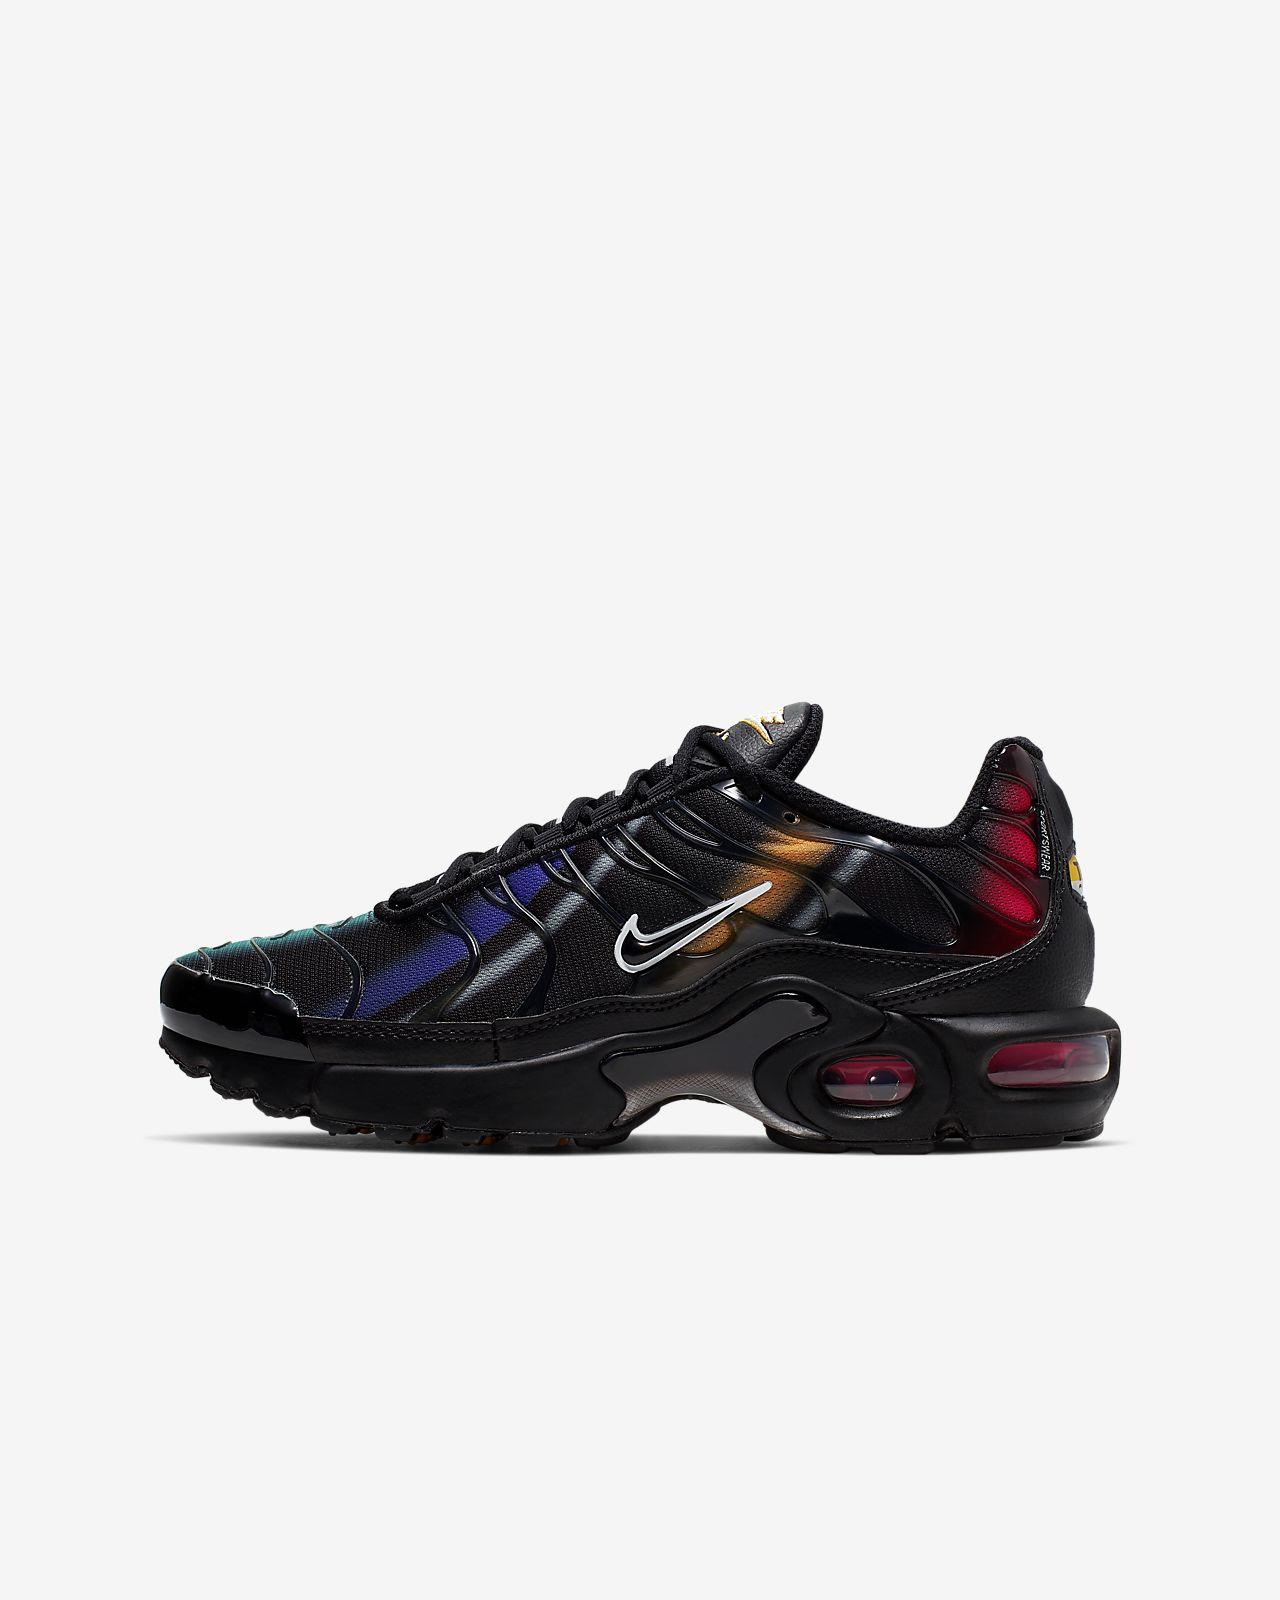 Für Schuh Kinder Nike Air Max Ältere Plus Game hQrxstdC